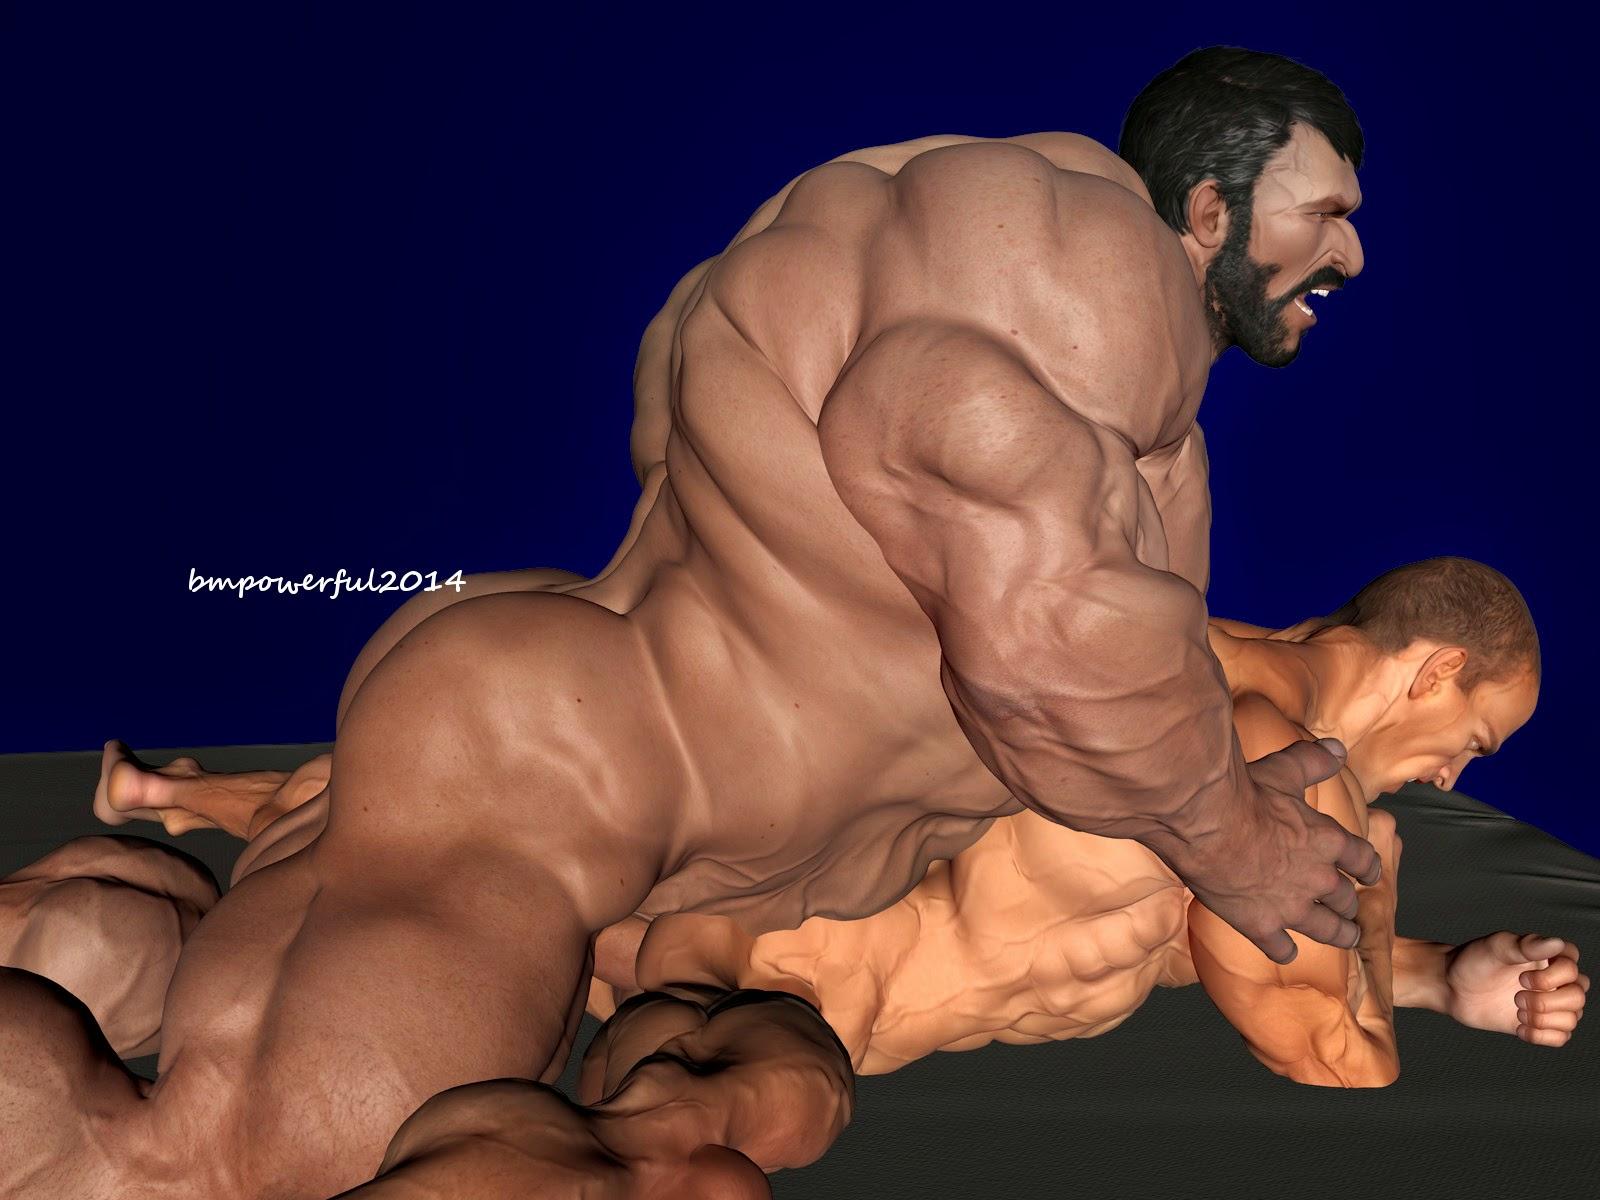 escort bodybuilder incontri gay pd